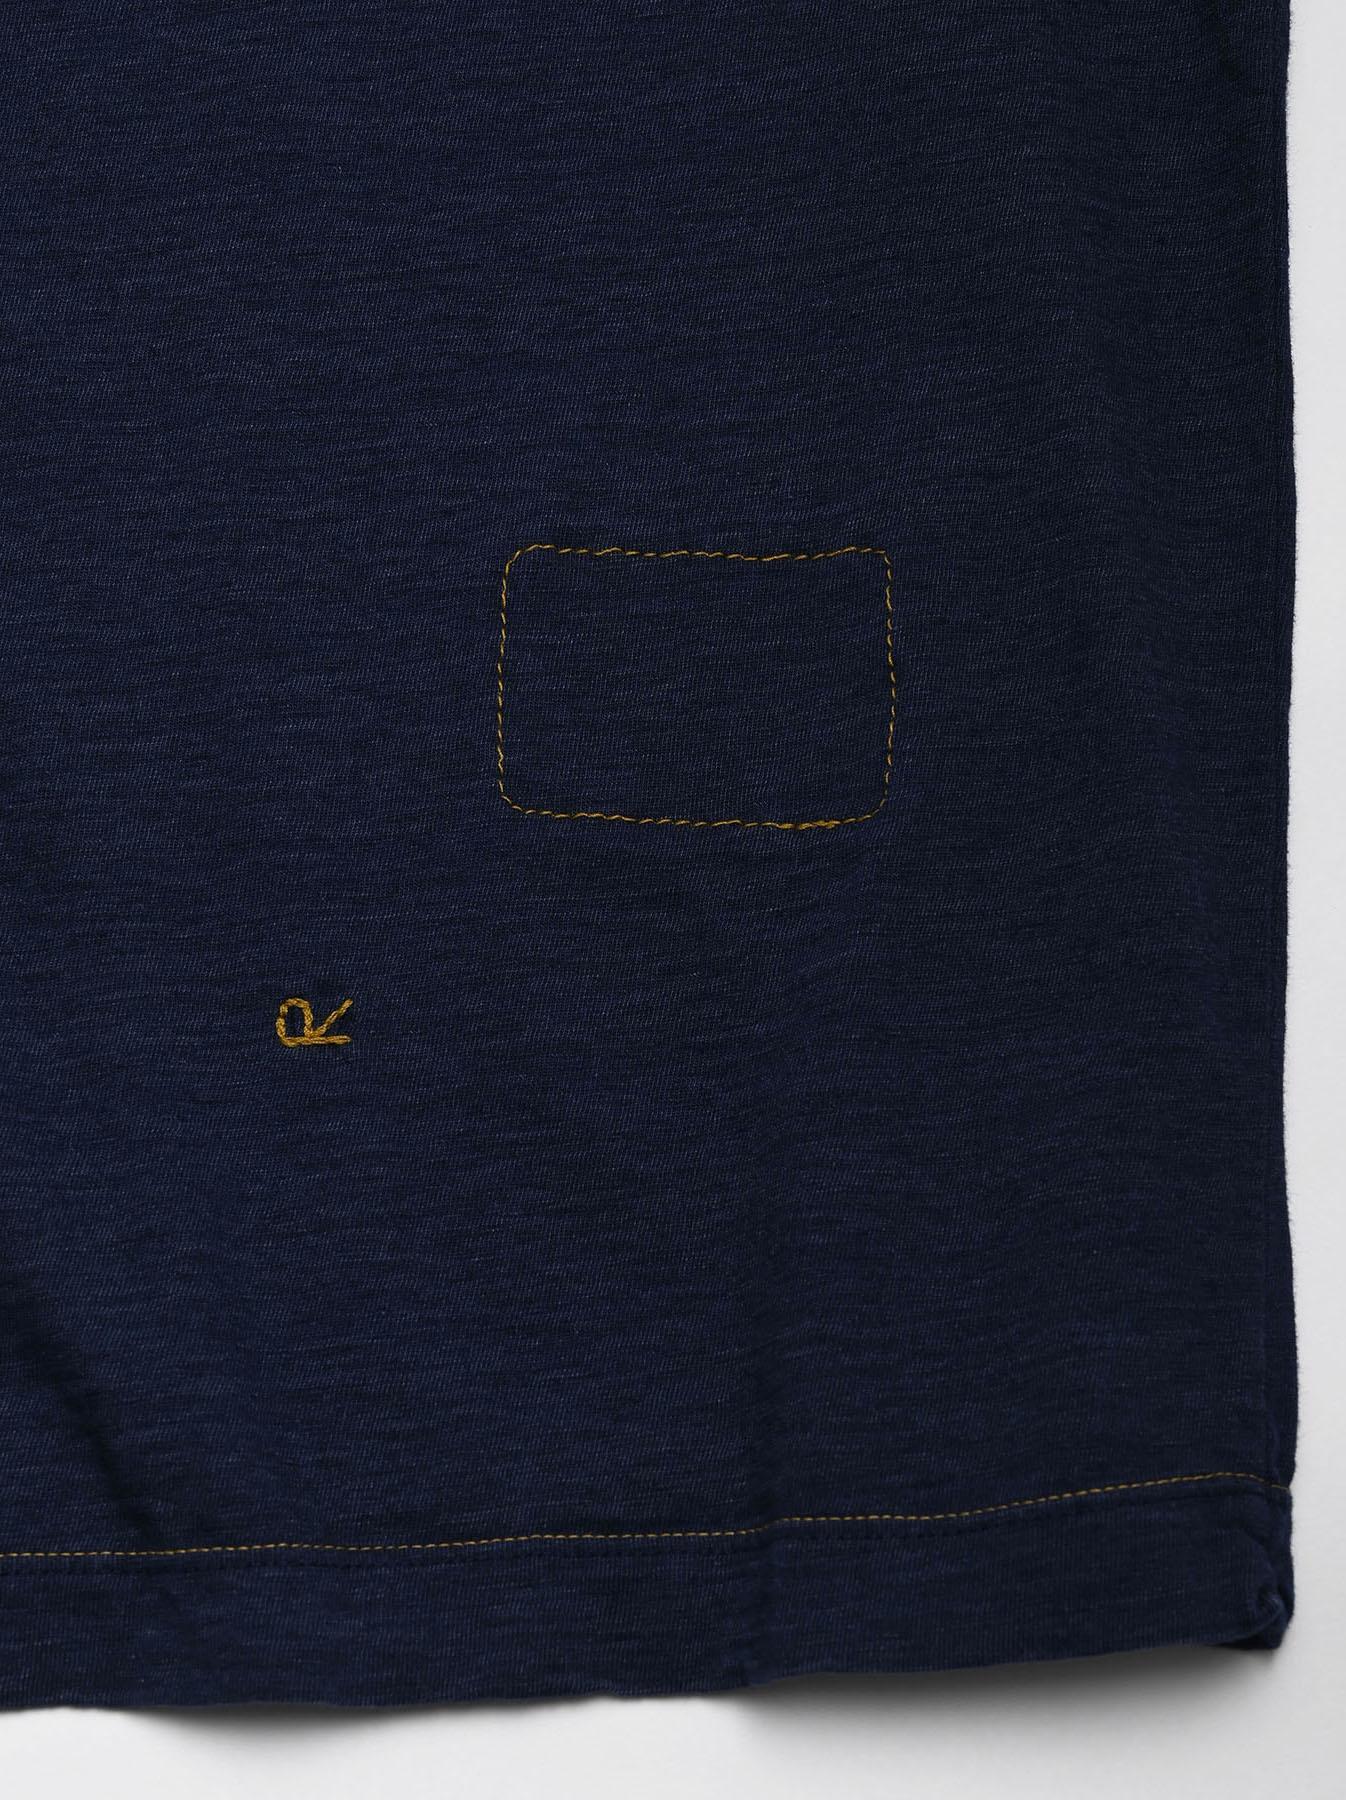 One Wash Indigo Tenjiku 908 Ocean T-Shirt (0621)-10